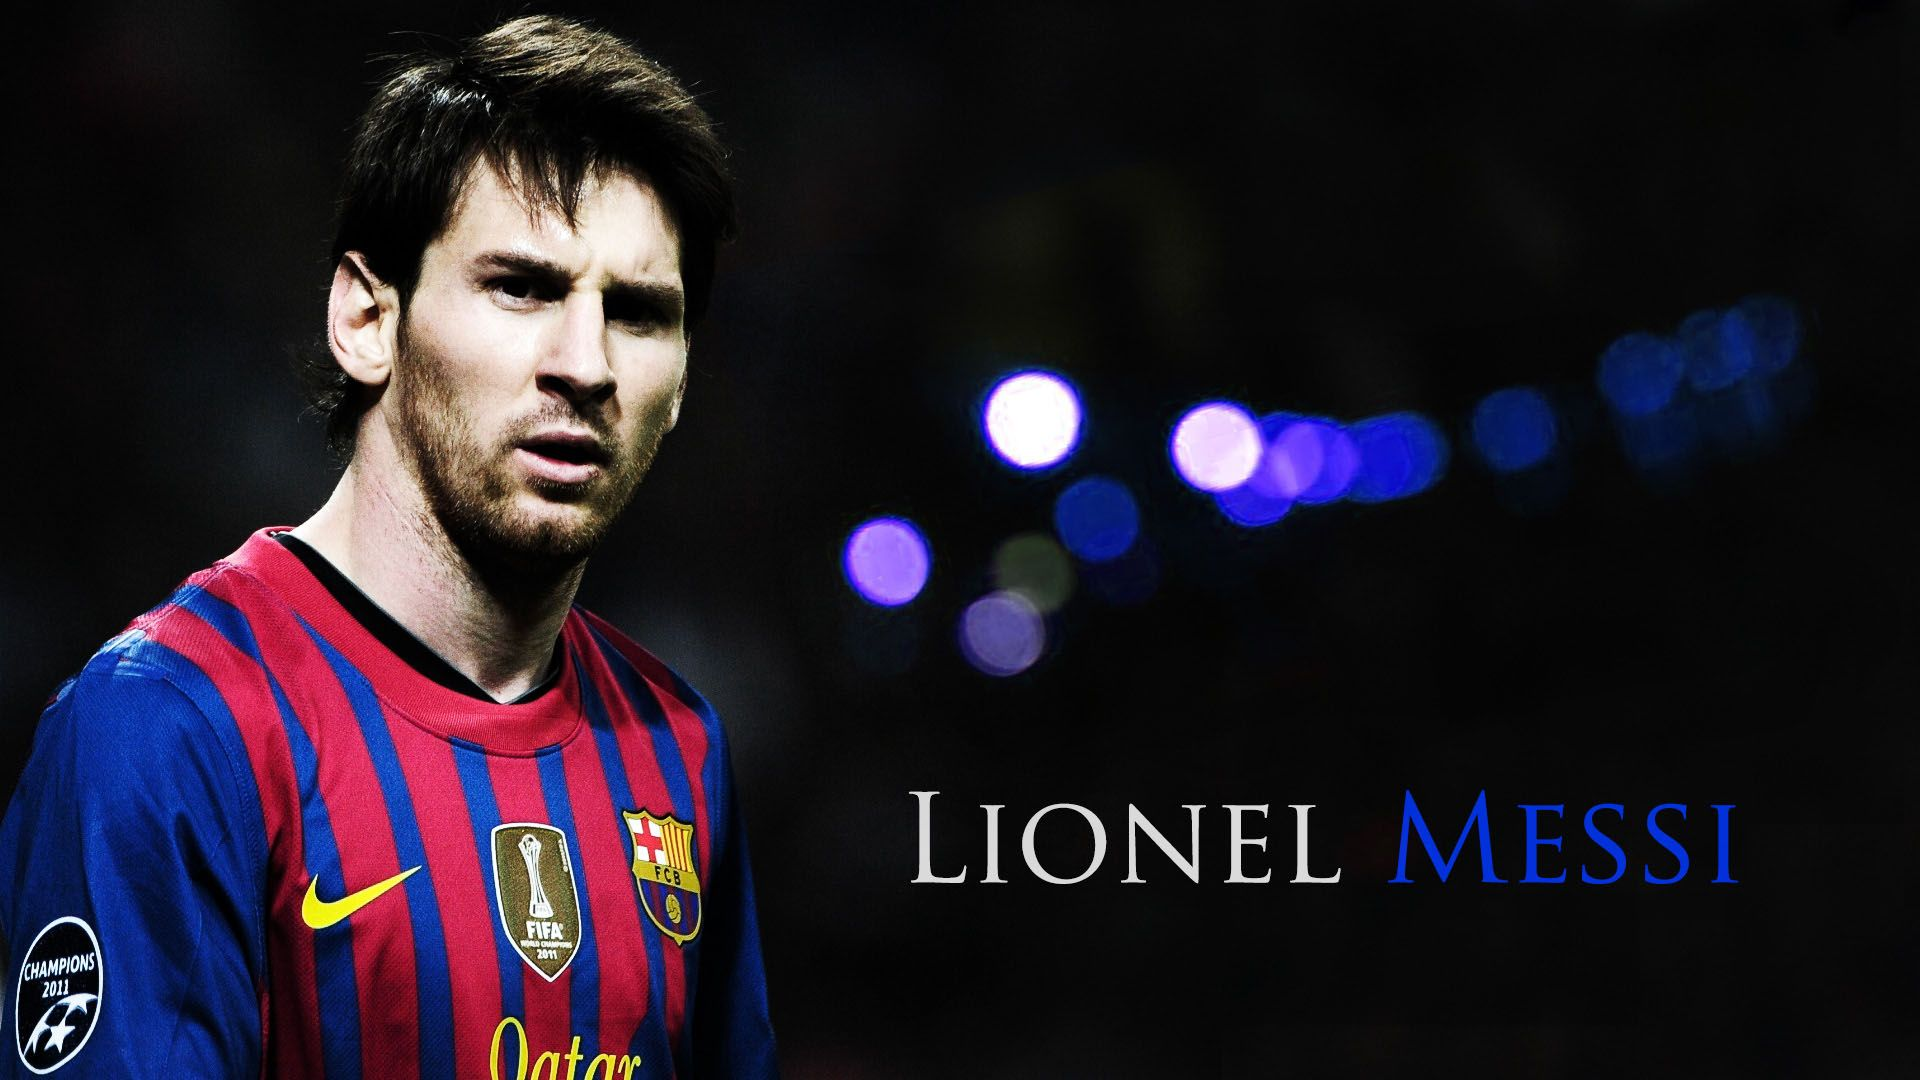 lionel messi wallpaper hd download - free download latest lionel